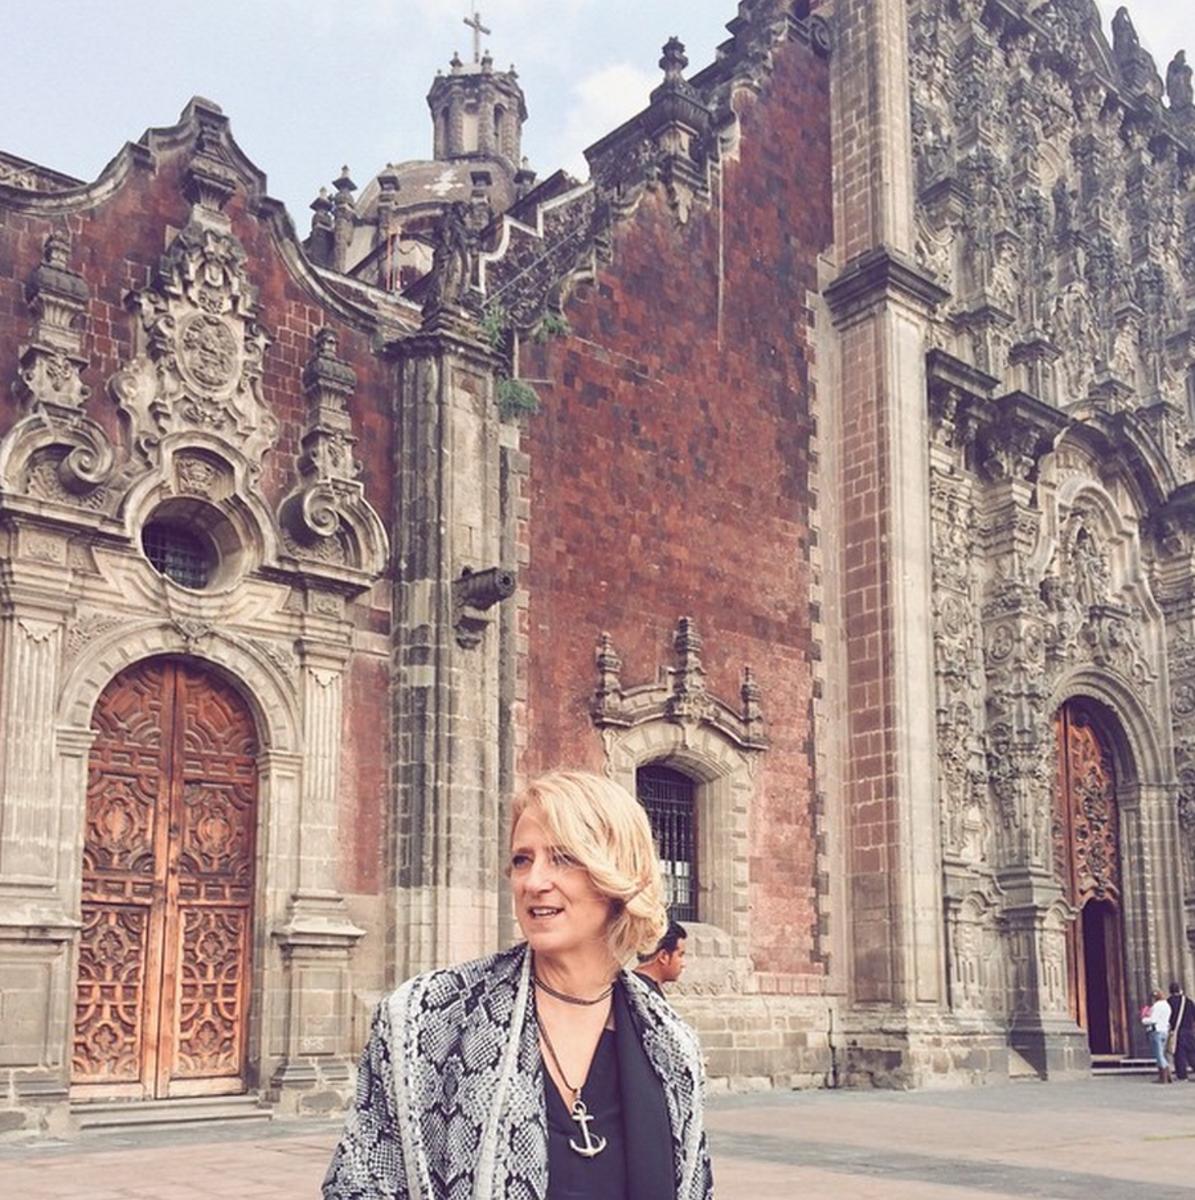 Nanette Lepore in Mexico City. Photo: Nanette Lepore